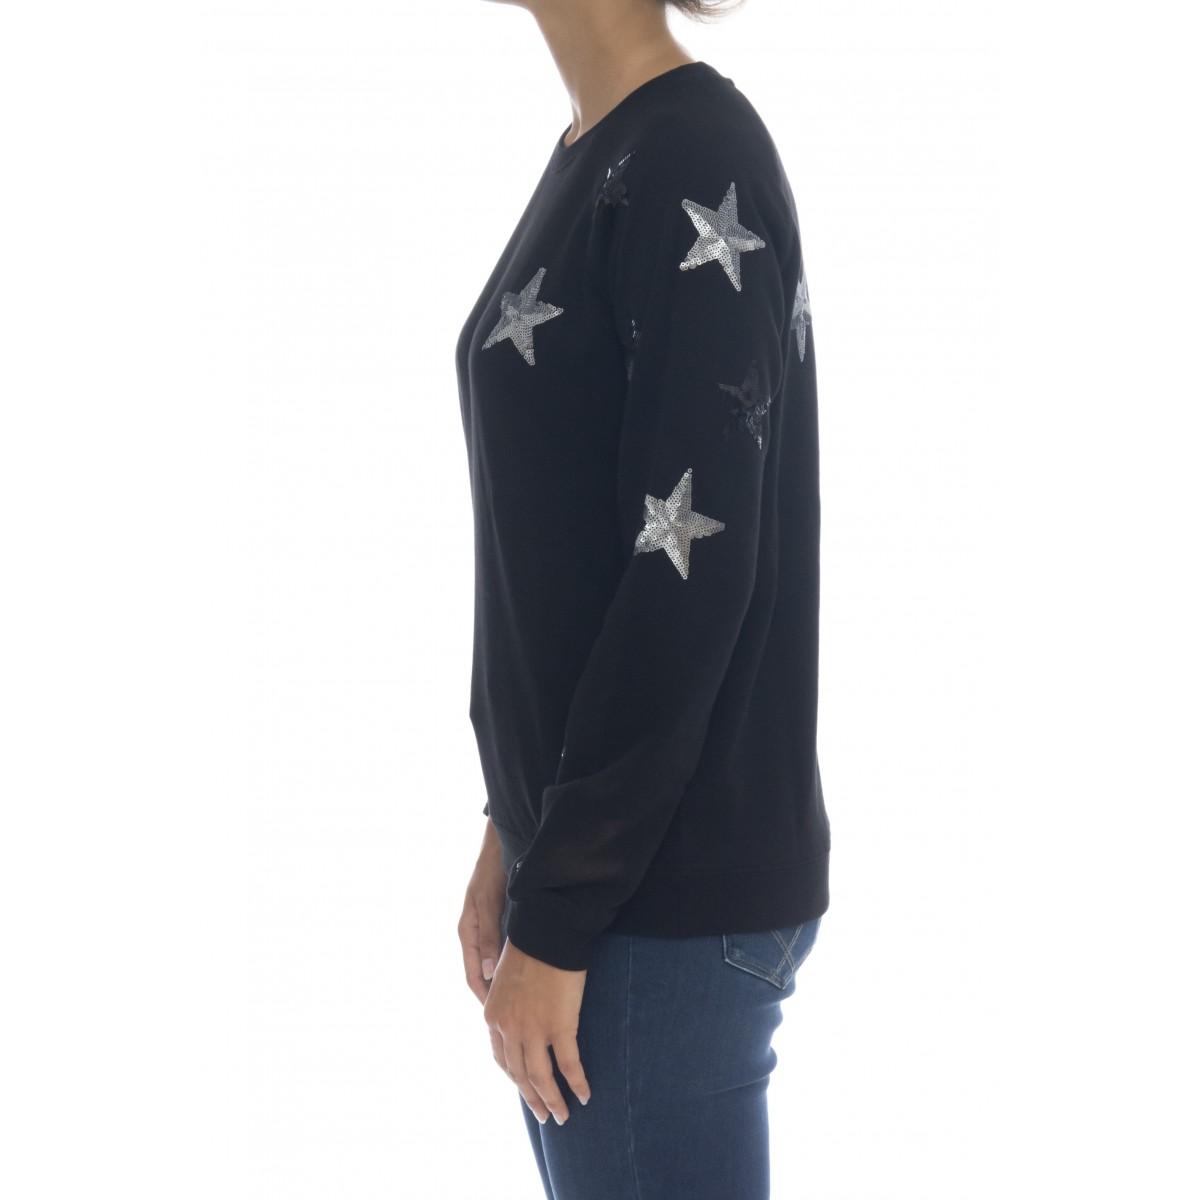 Felpa donna - F40207 felpe stelle